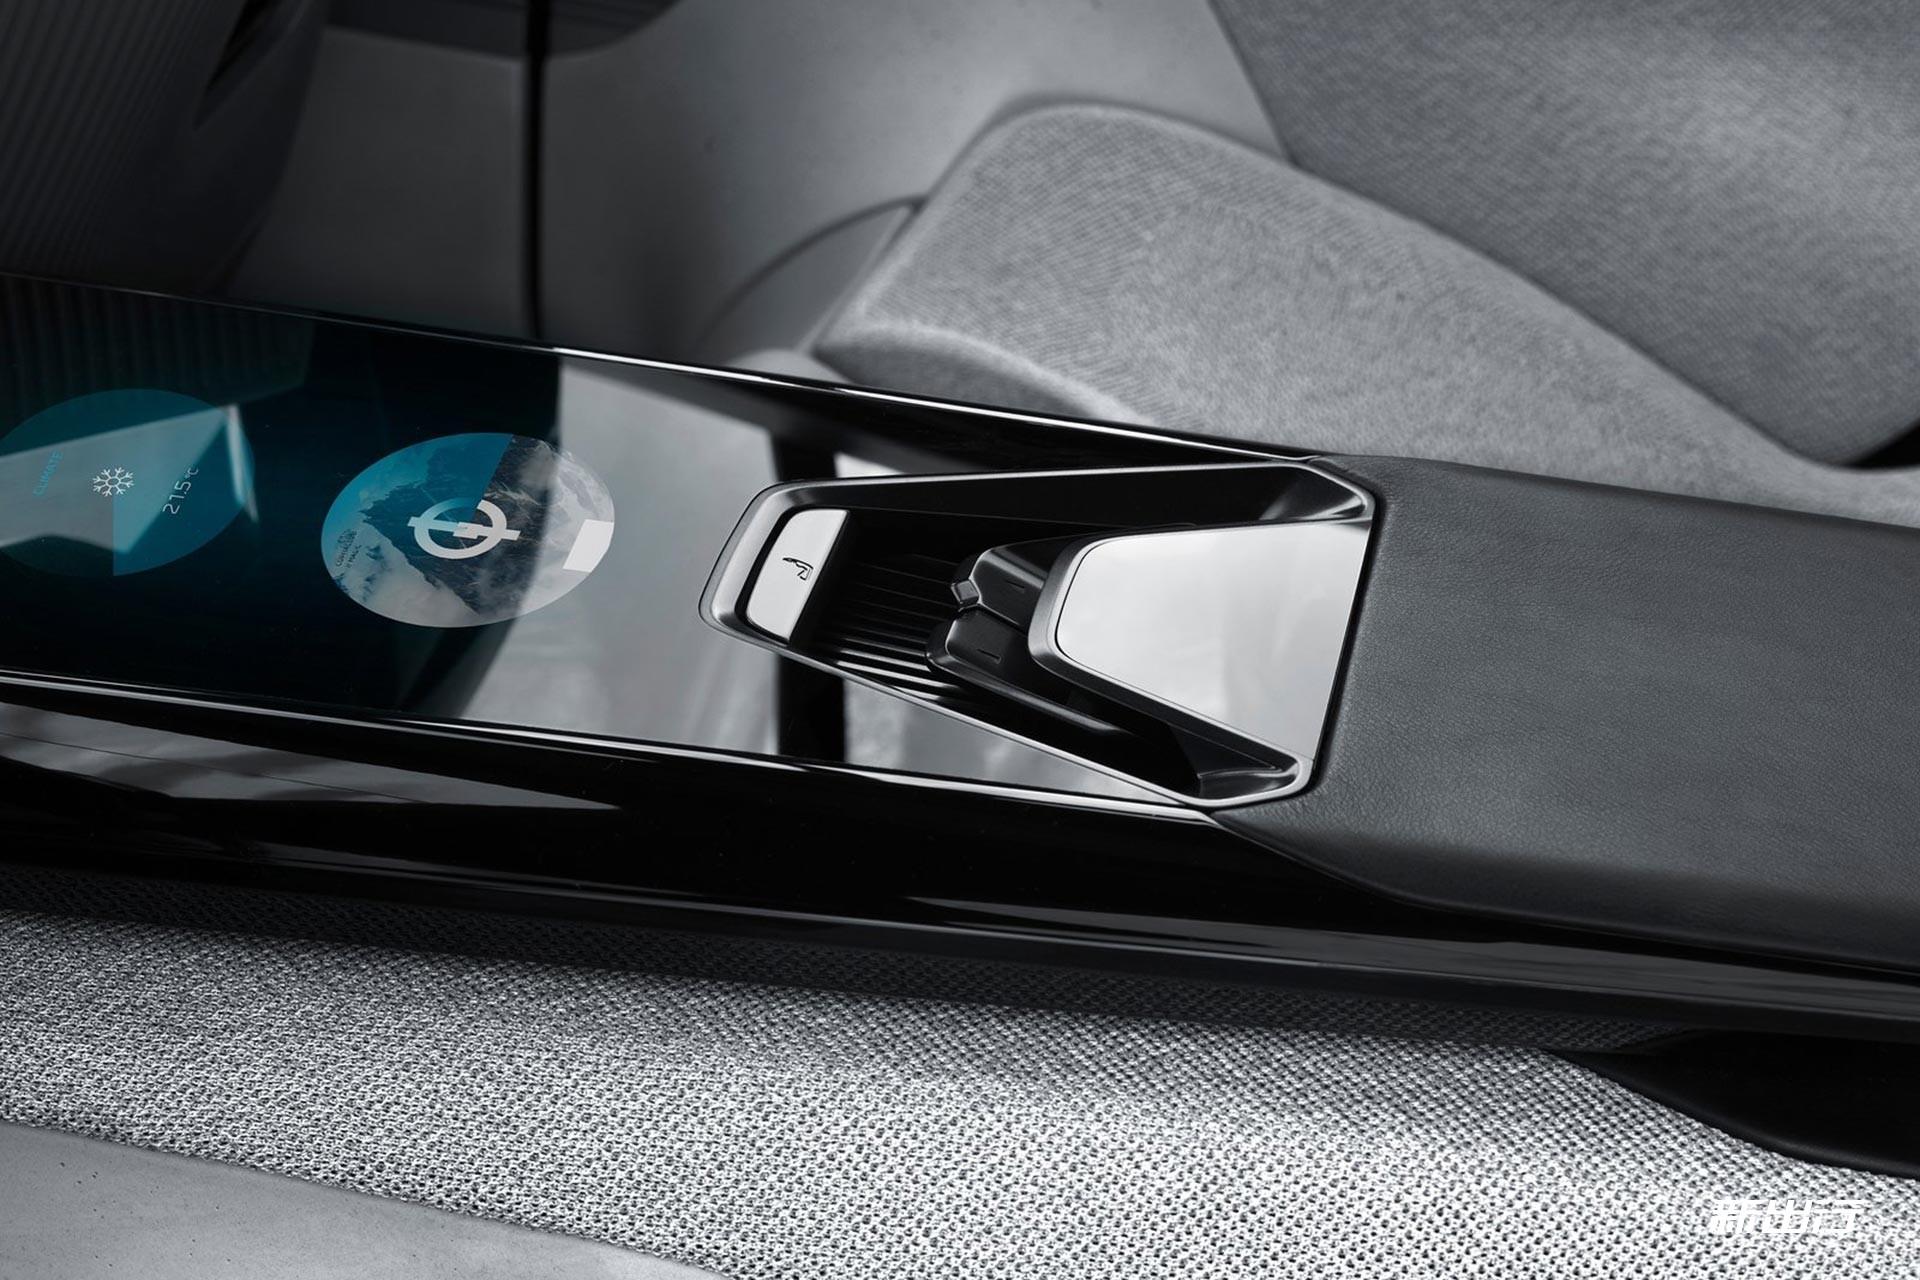 Peugeot-Instinct_Concept-2017-1600-2f.jpg